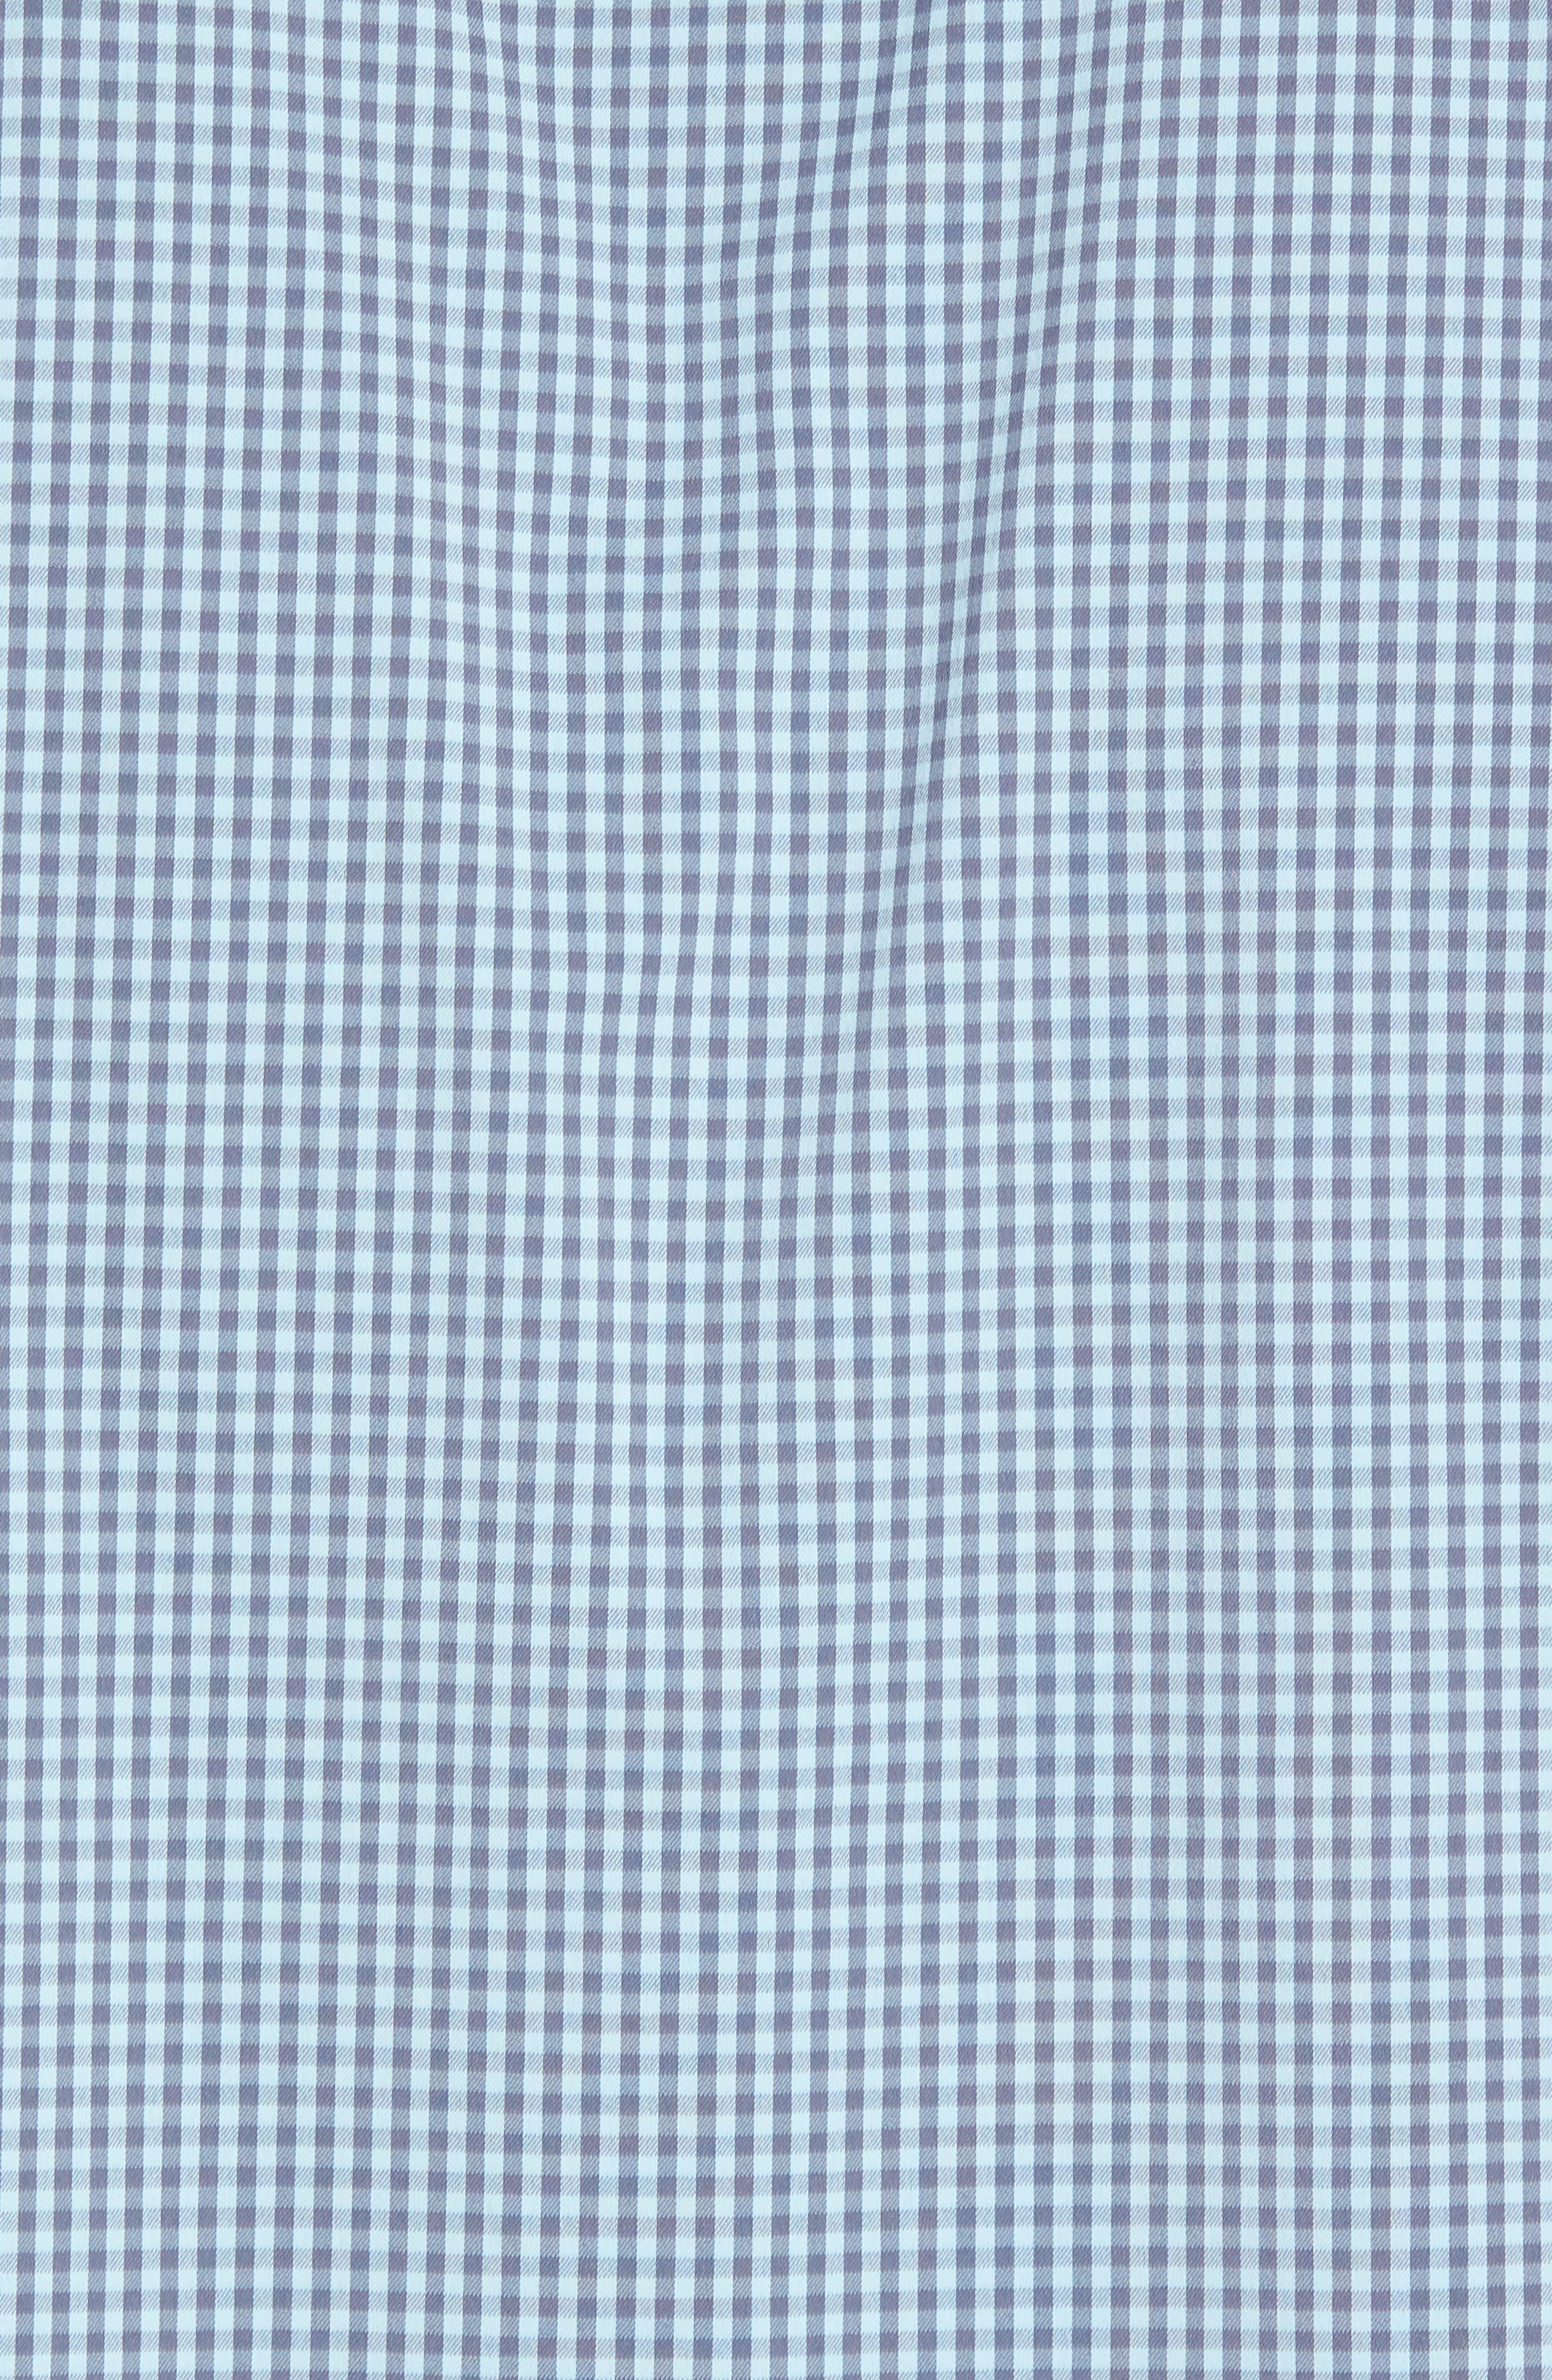 Gygax Regular Fit Sport Shirt,                             Alternate thumbnail 5, color,                             Porcelain Blue